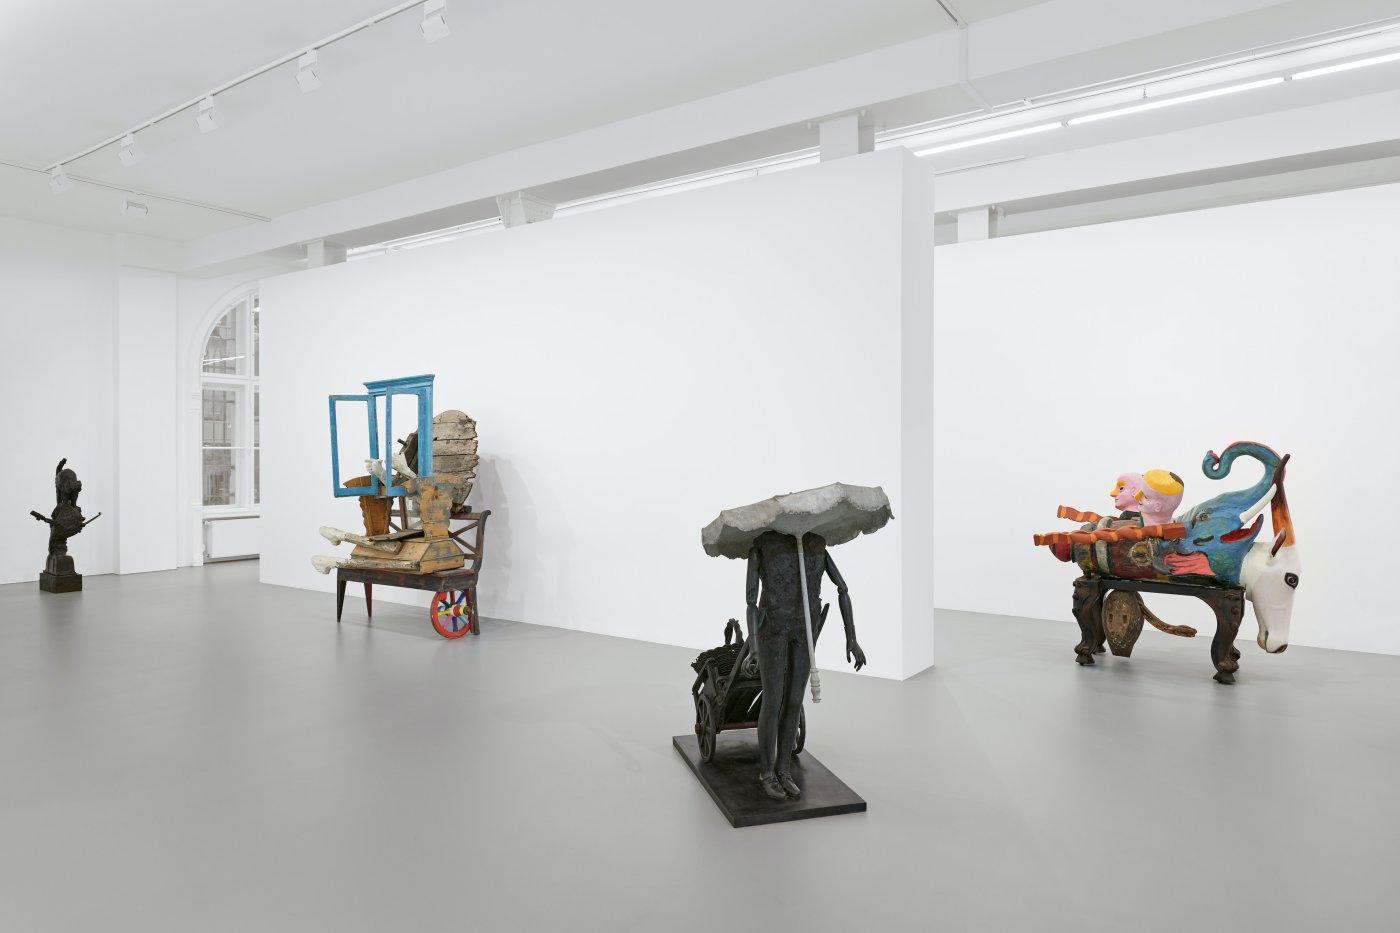 Galerie Max Hetzler Goethestrasse Karel Appel 5